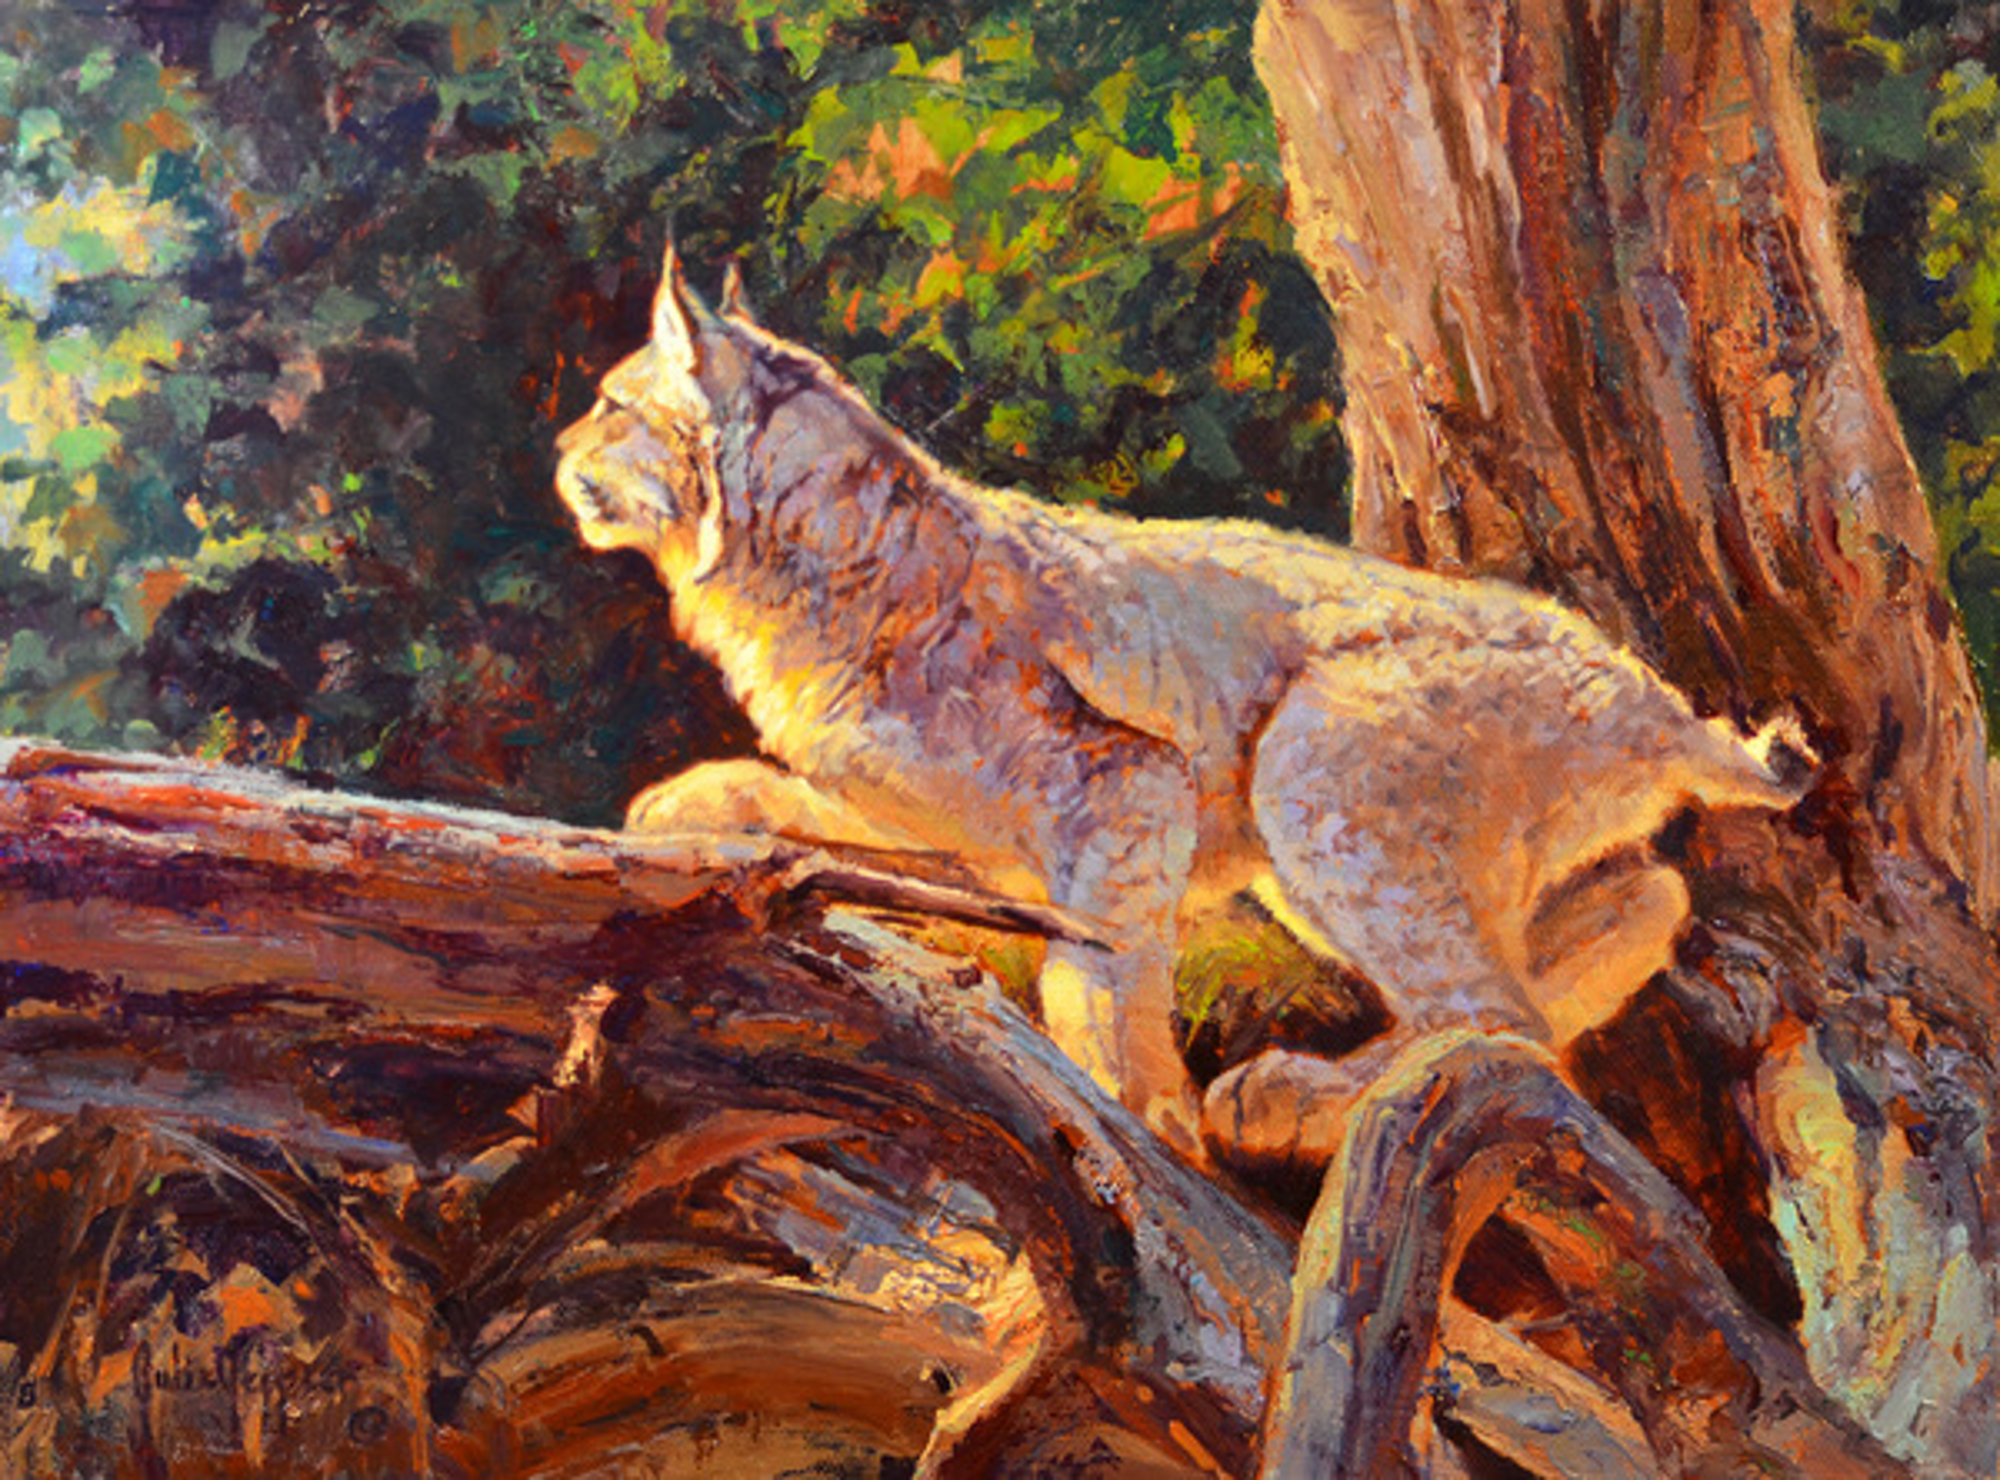 Spring Lynx by Julie Jeppsen